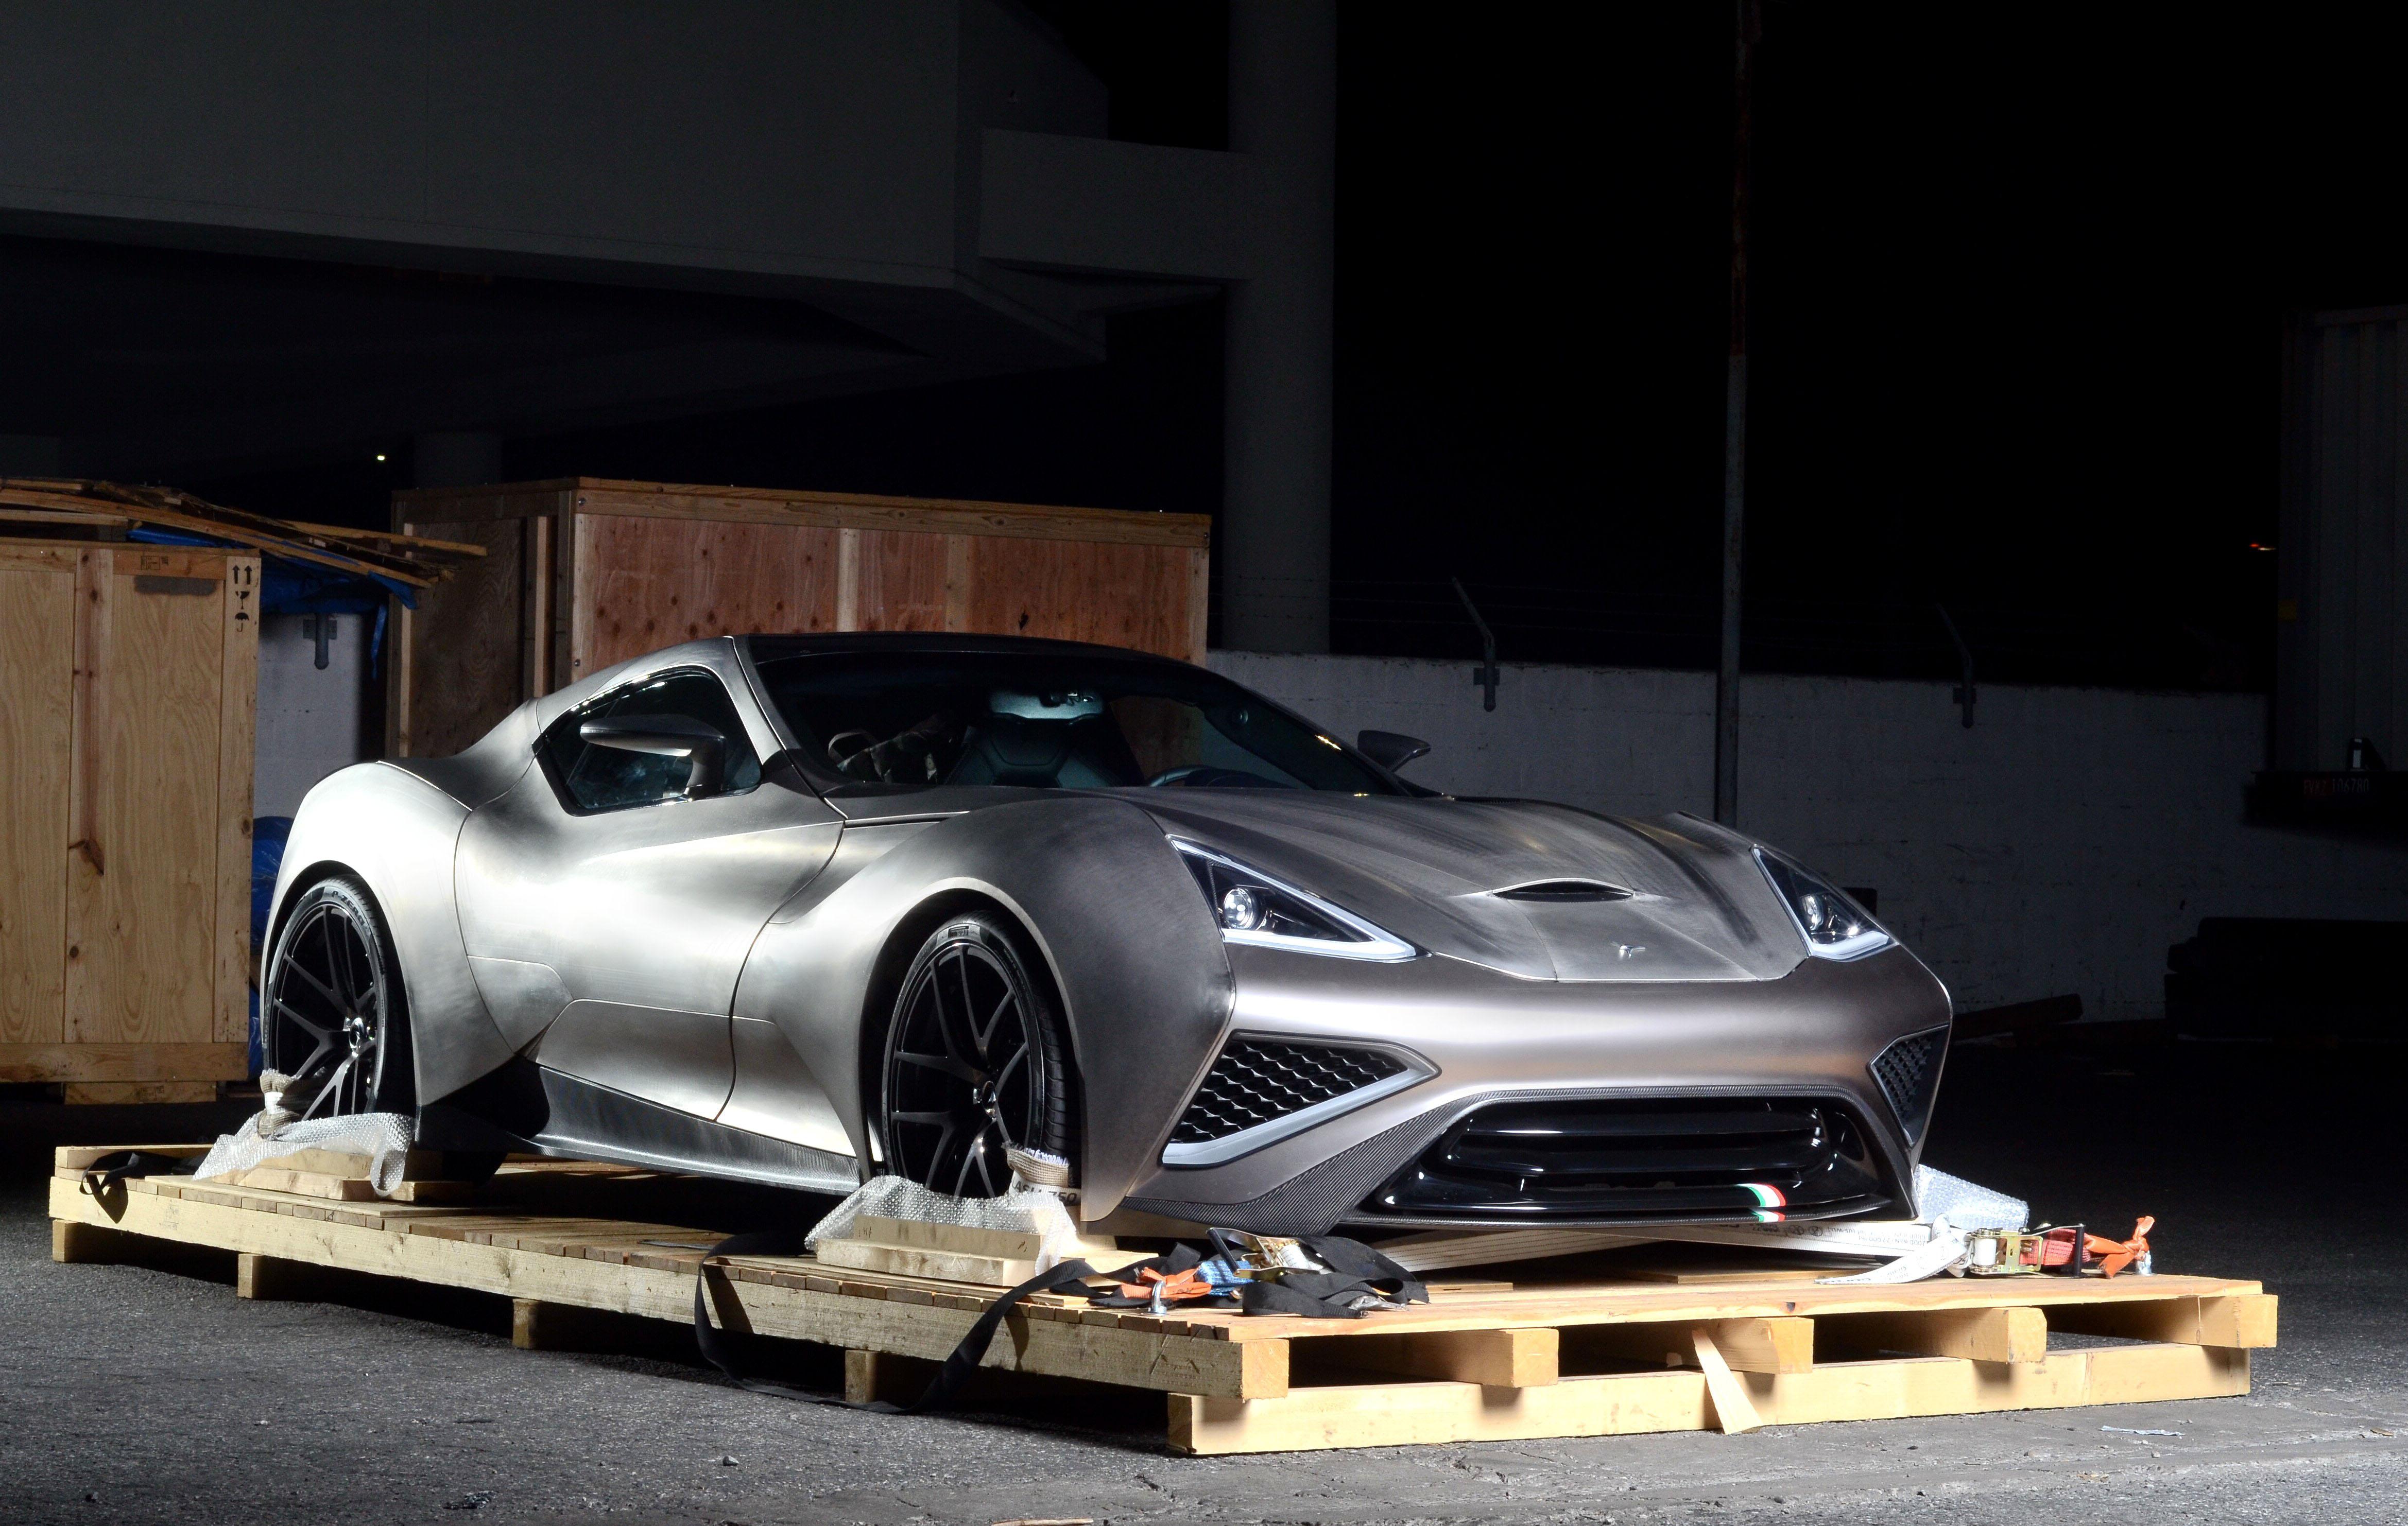 Steel is so 2015. Think titanium for the Vulcano supercar...